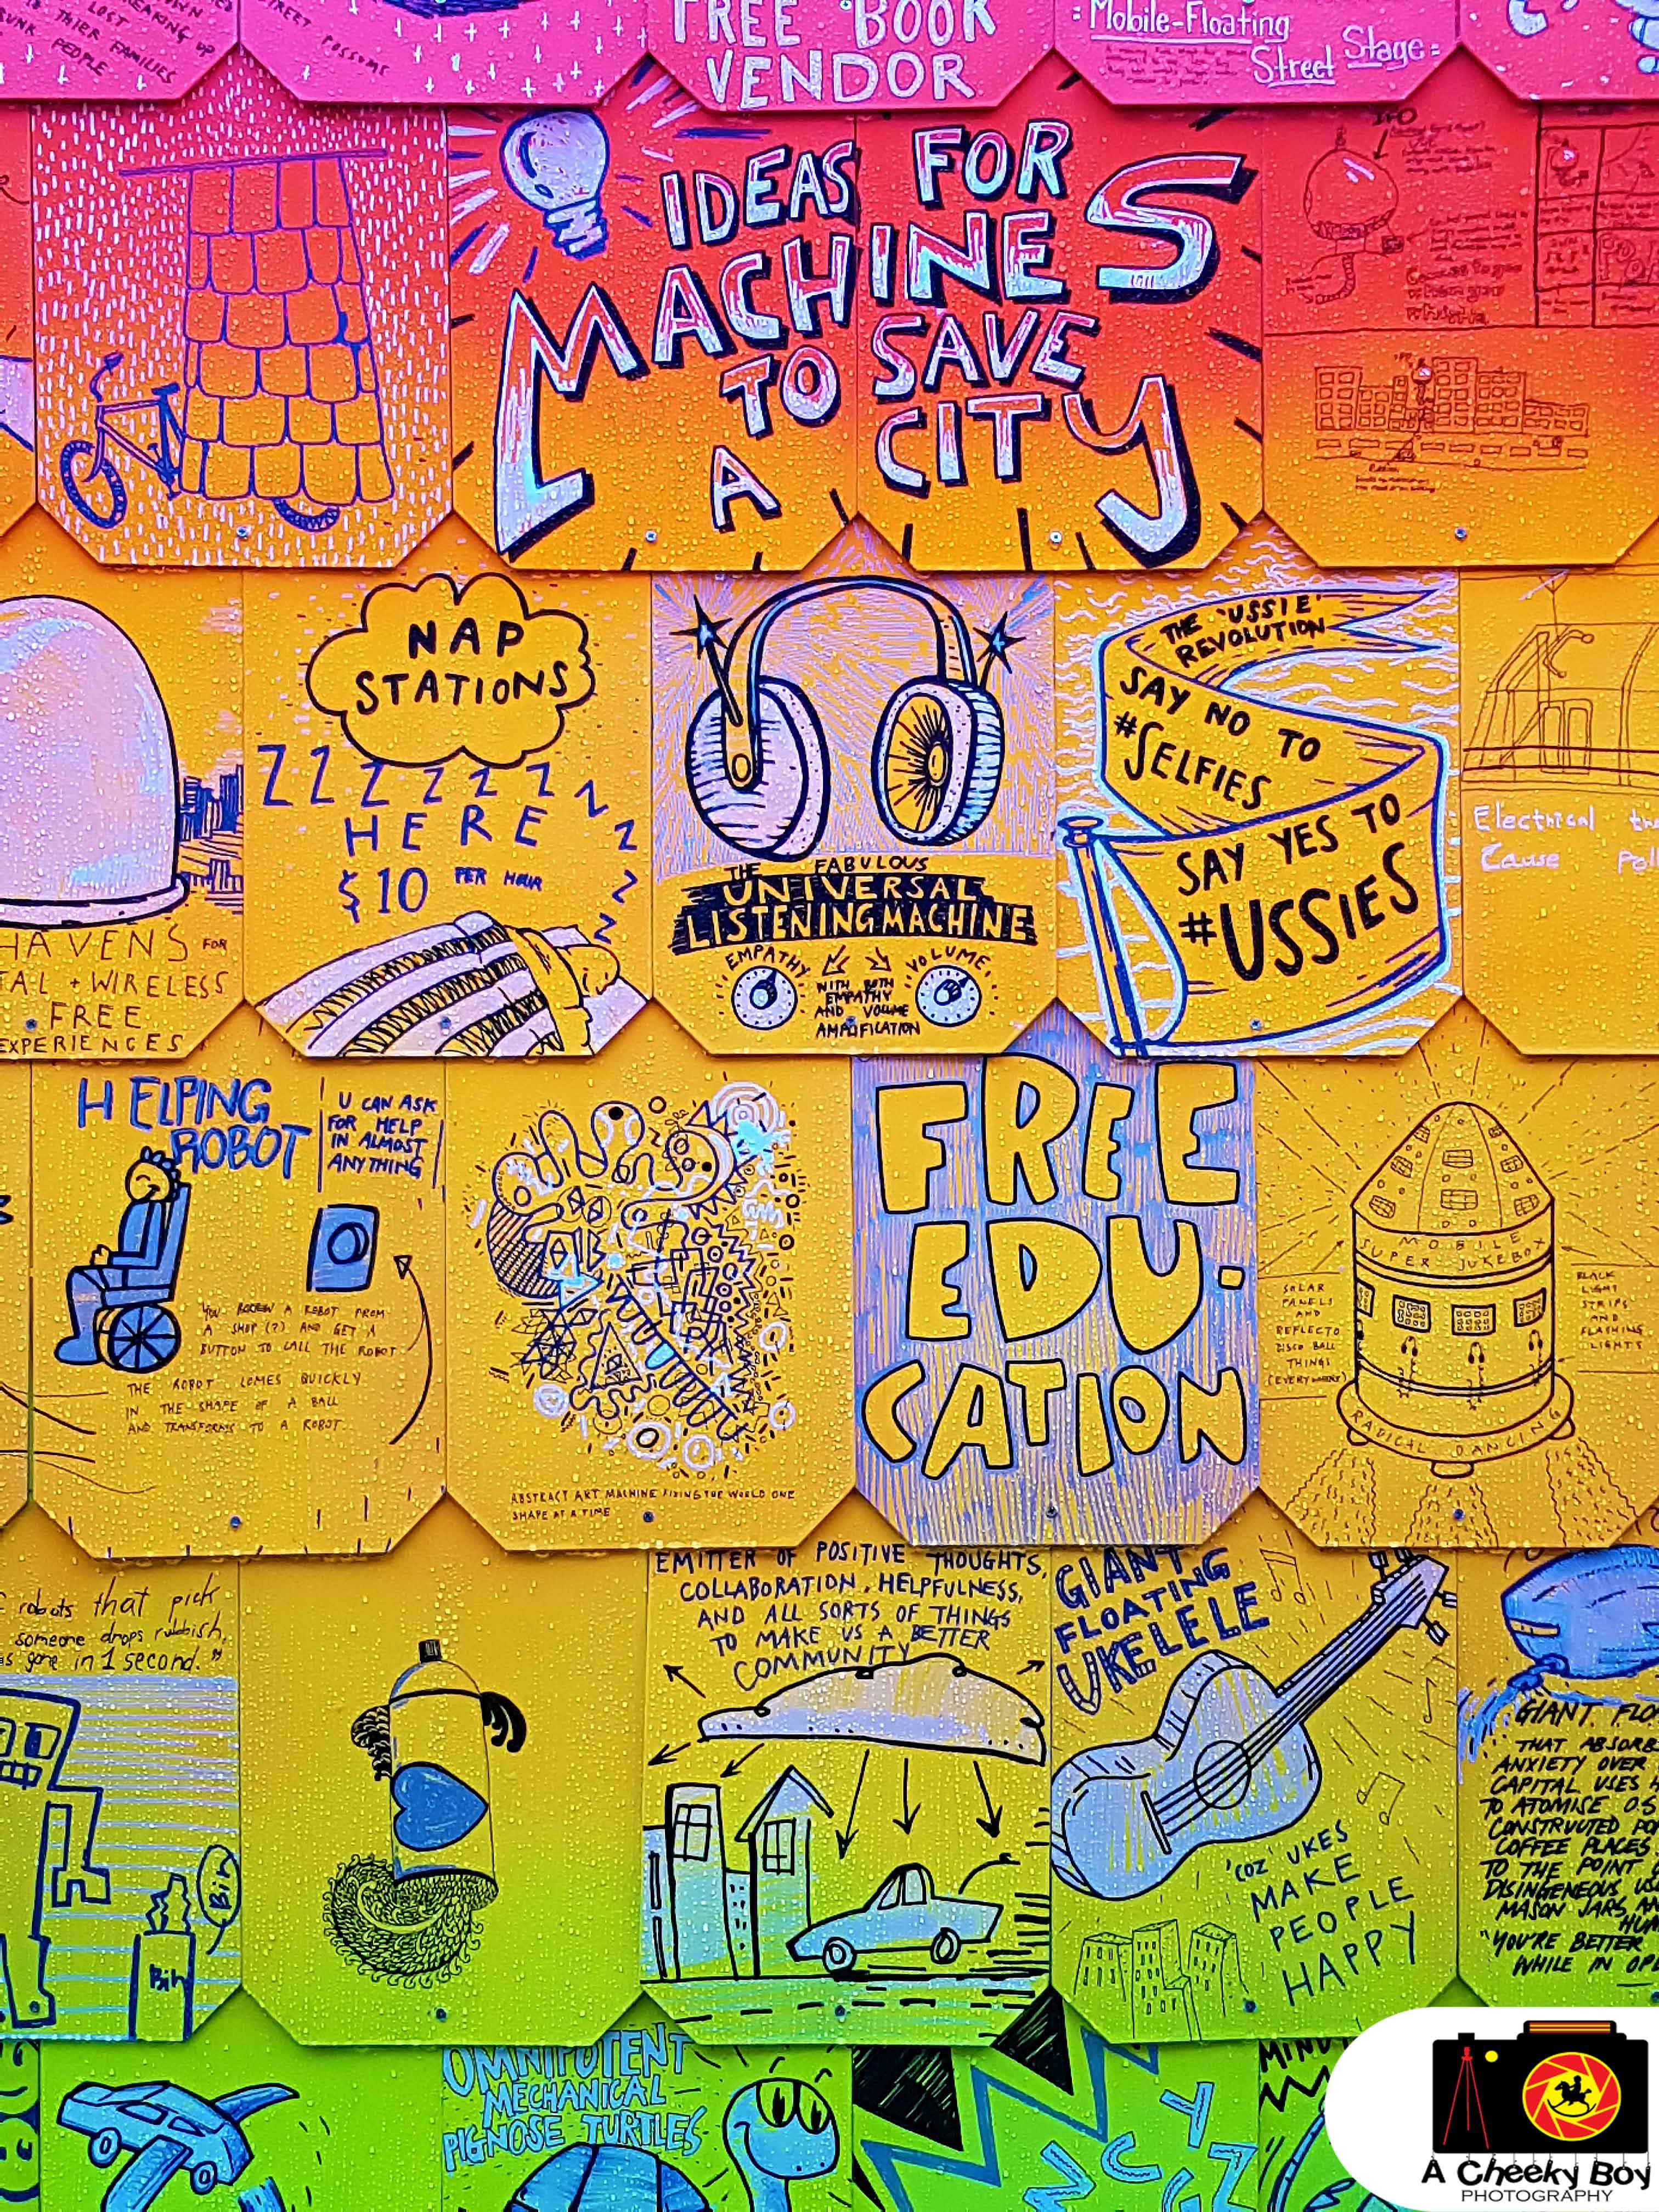 Street Wall Art – A Cheeky Boy Photography